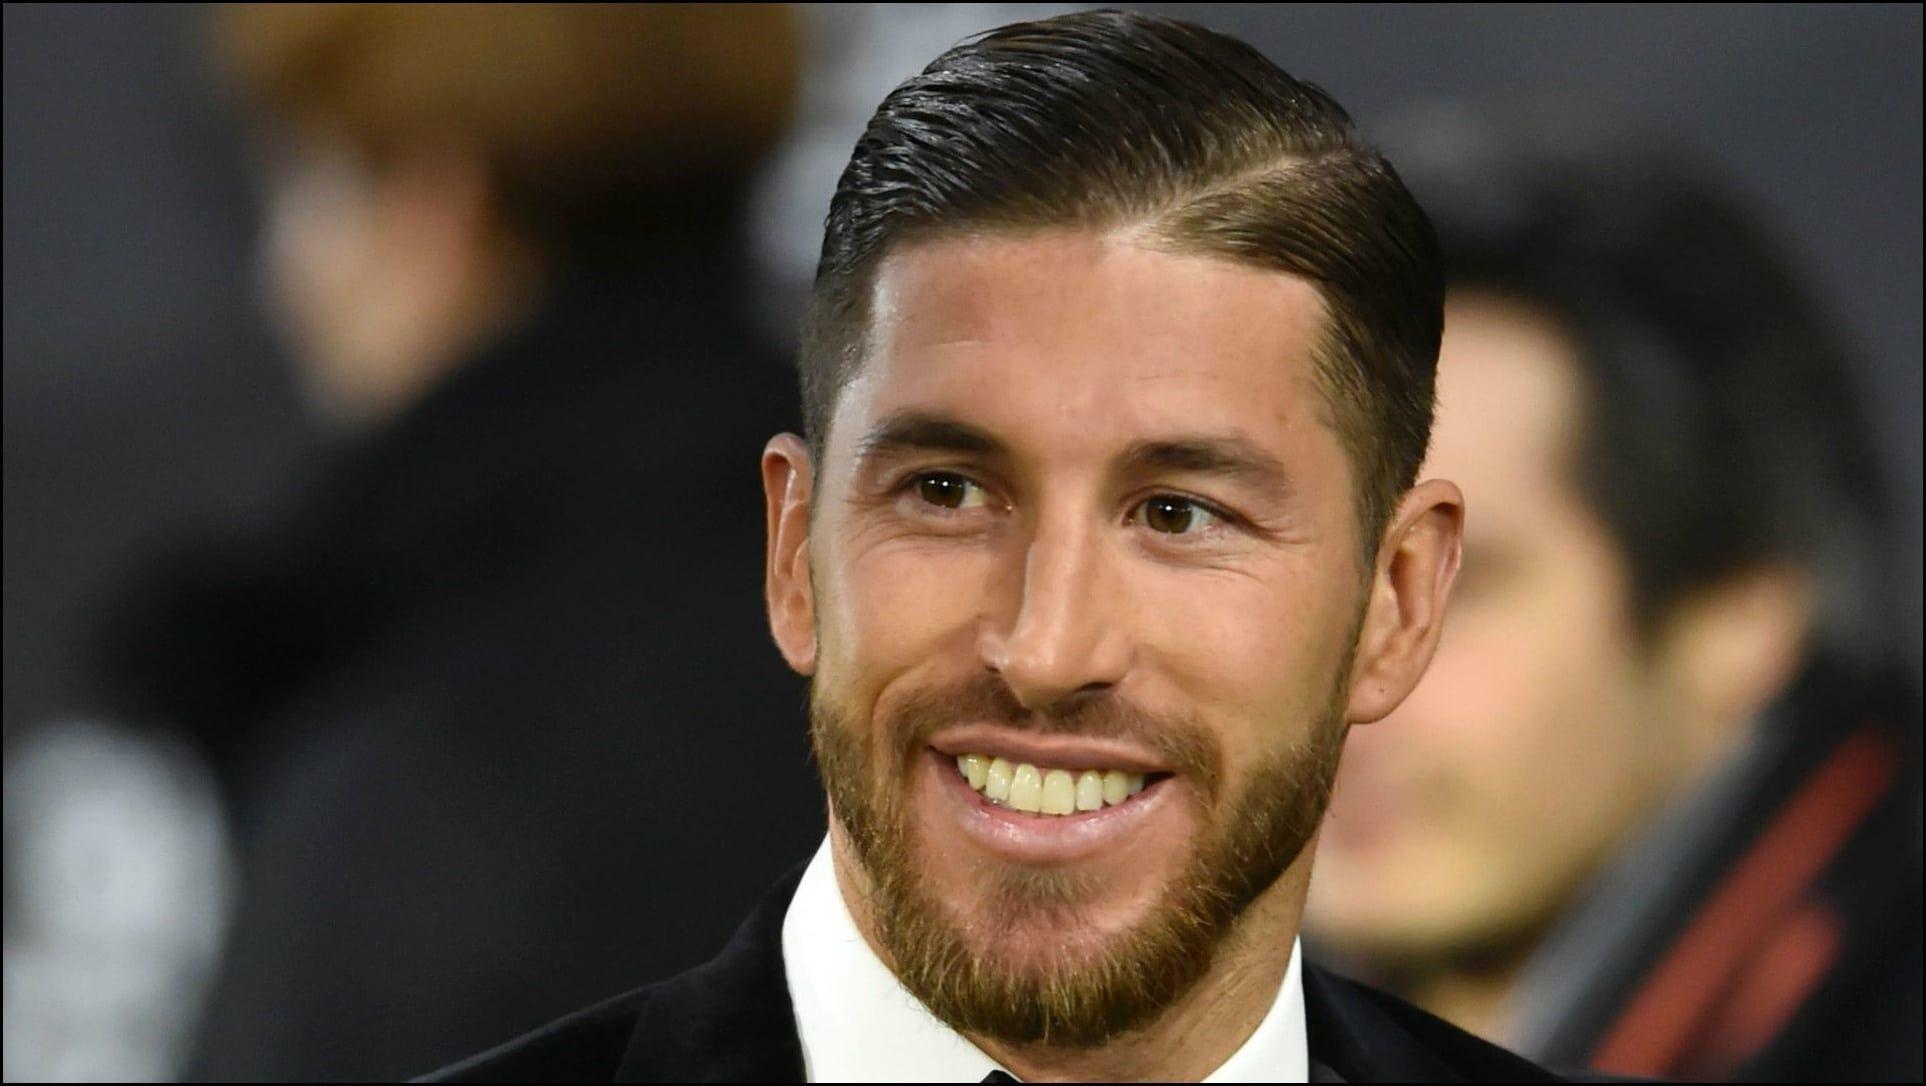 Sergio Ramos Haarschnitt Sergio Ramos Ramos Haircut And Haircuts Meine Frisuren Haarschnitt Sergio Ramos Haarschnitt Ideen